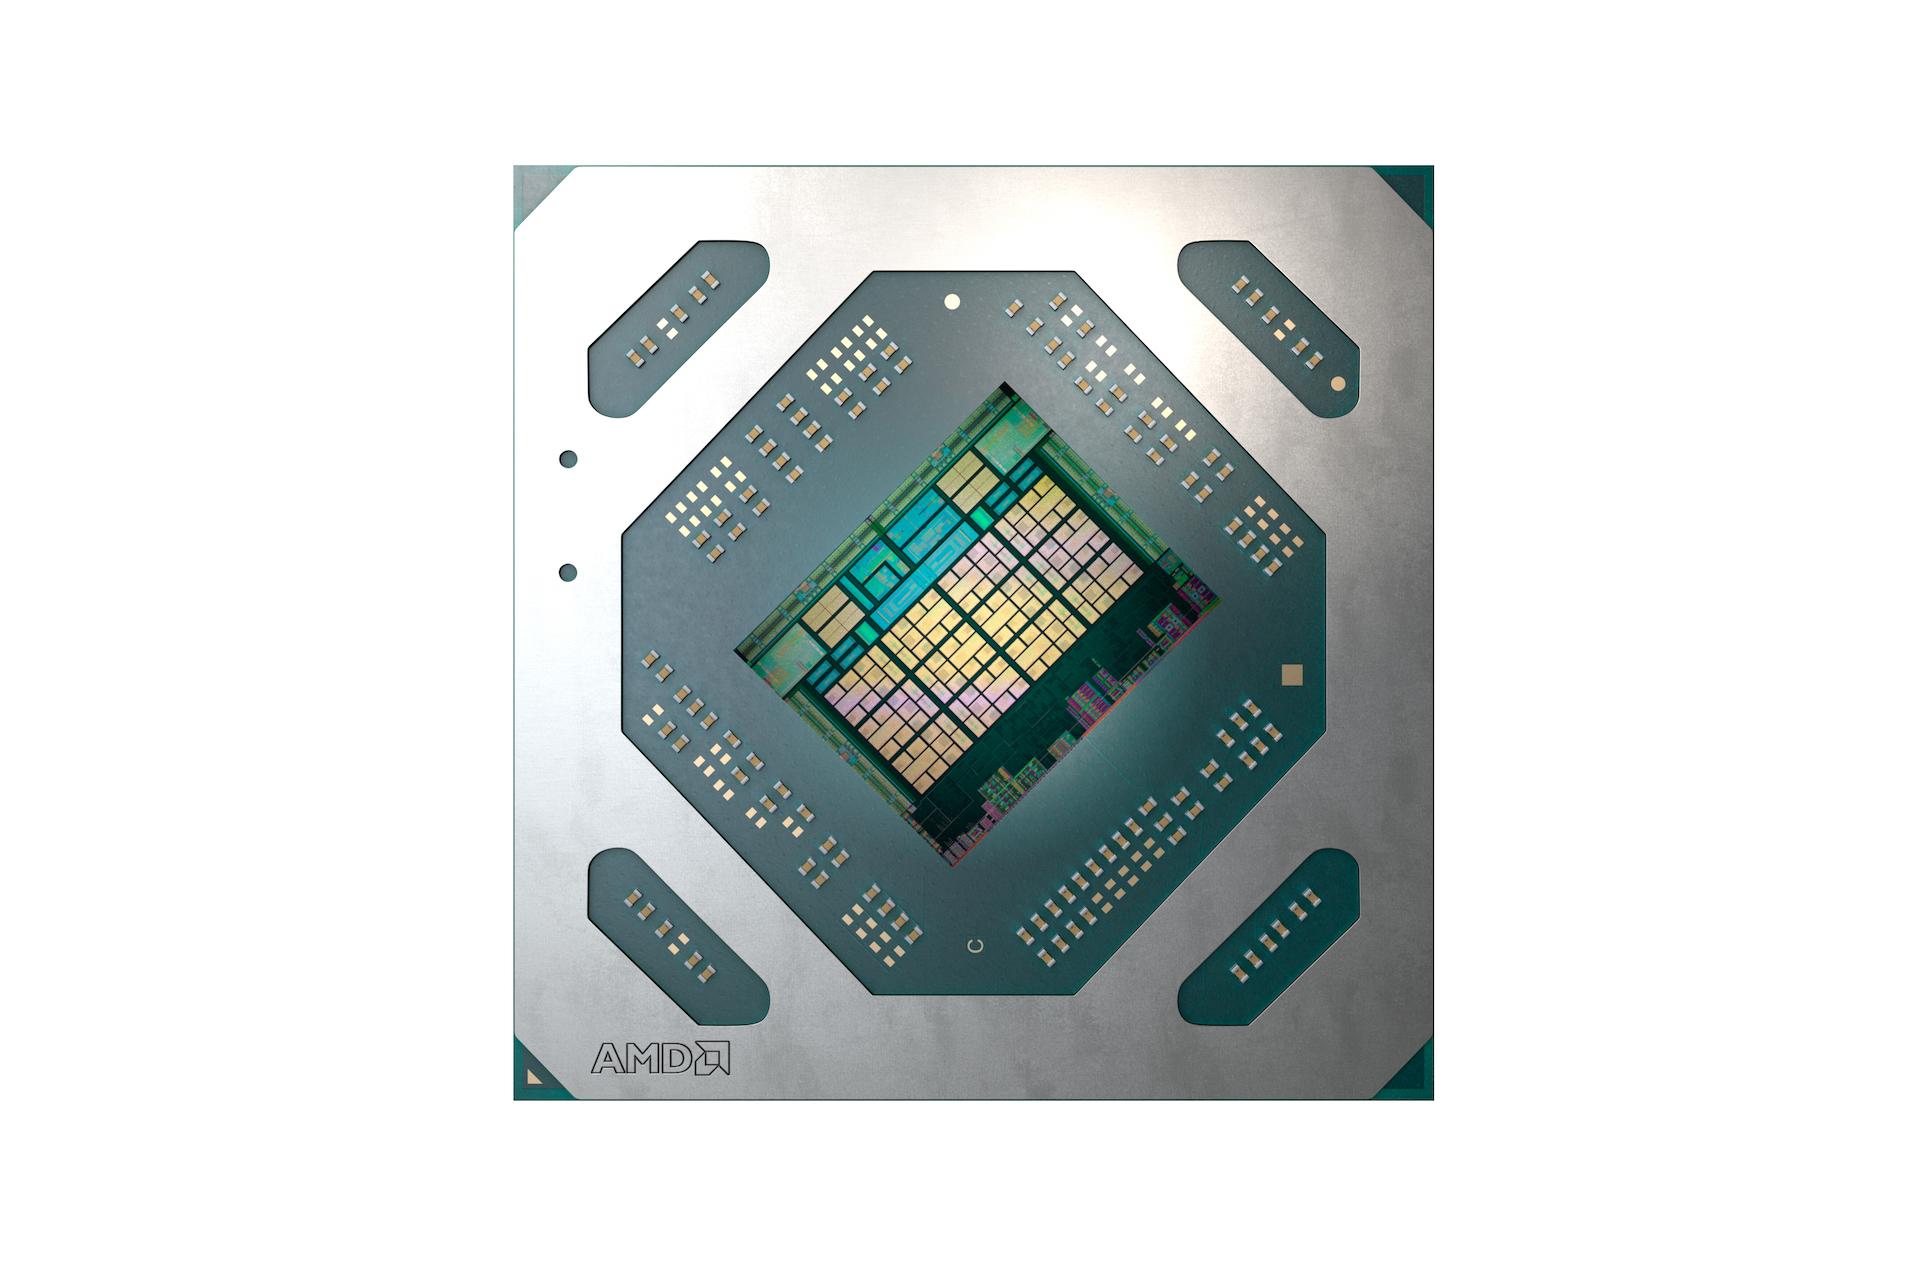 AMD Announces Radeon RX 5500 and 5500M: Mainstream Navi - Graphics Cards 4